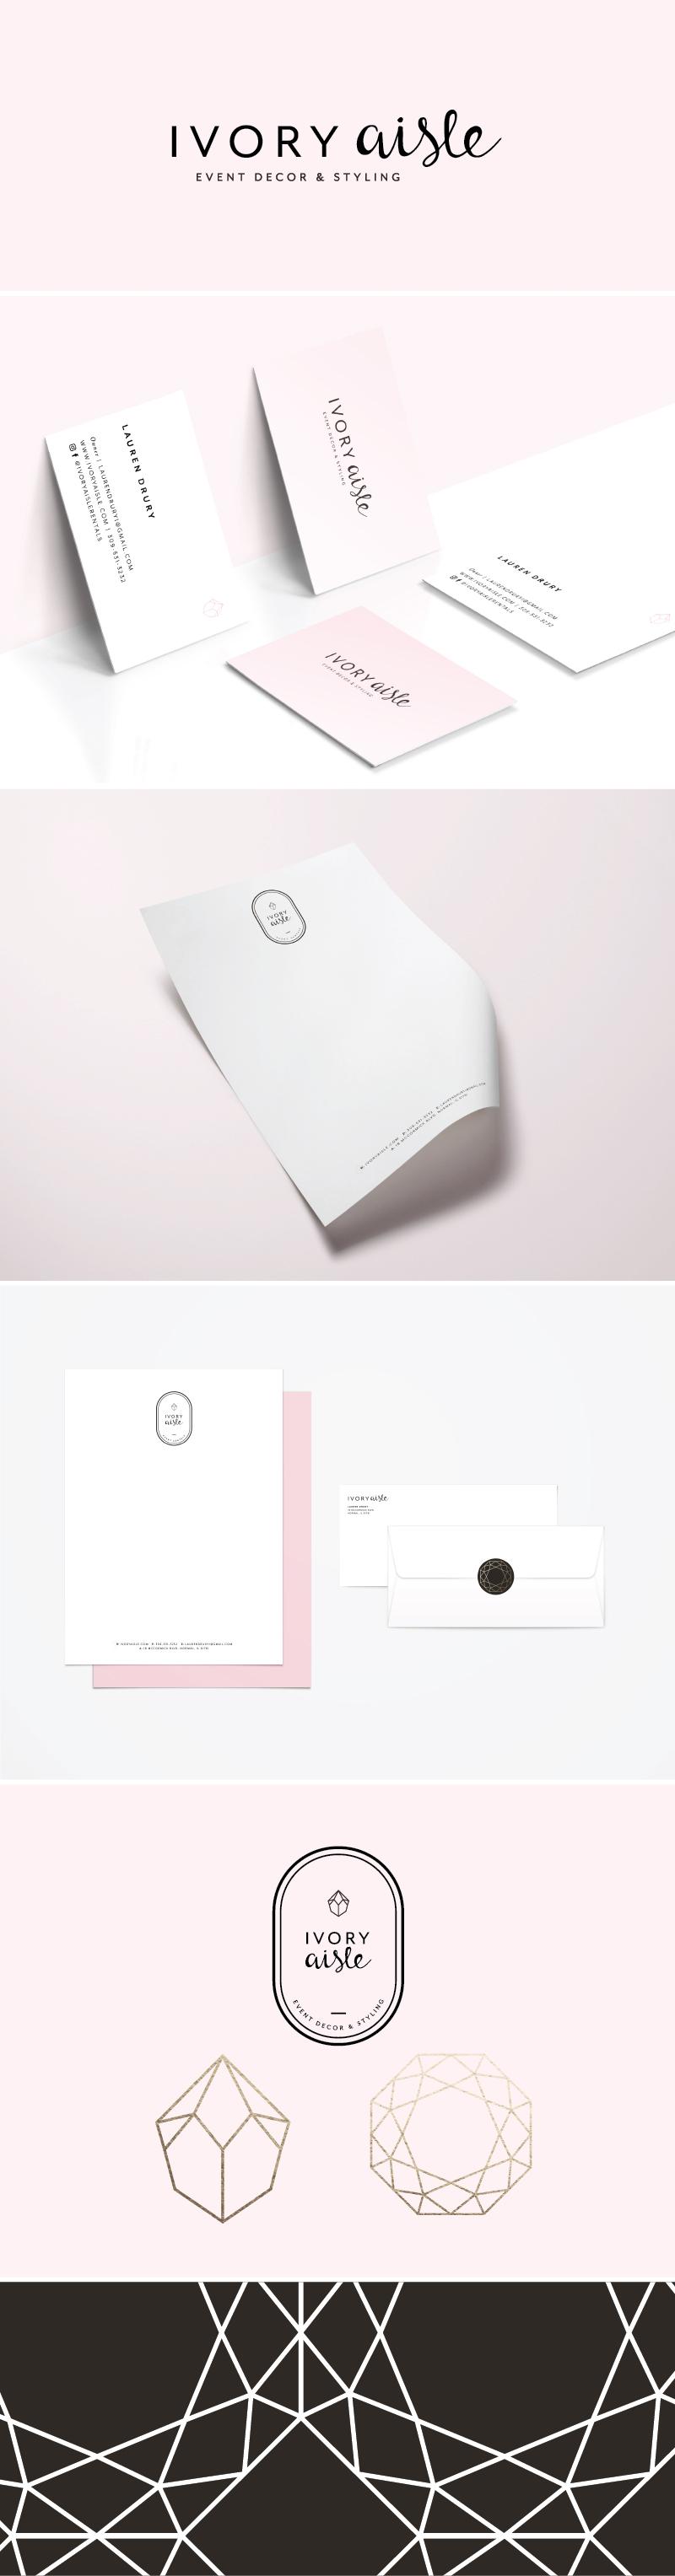 Ivory-Aisle-Logo-Branding-Visual-Identity-2.jpg